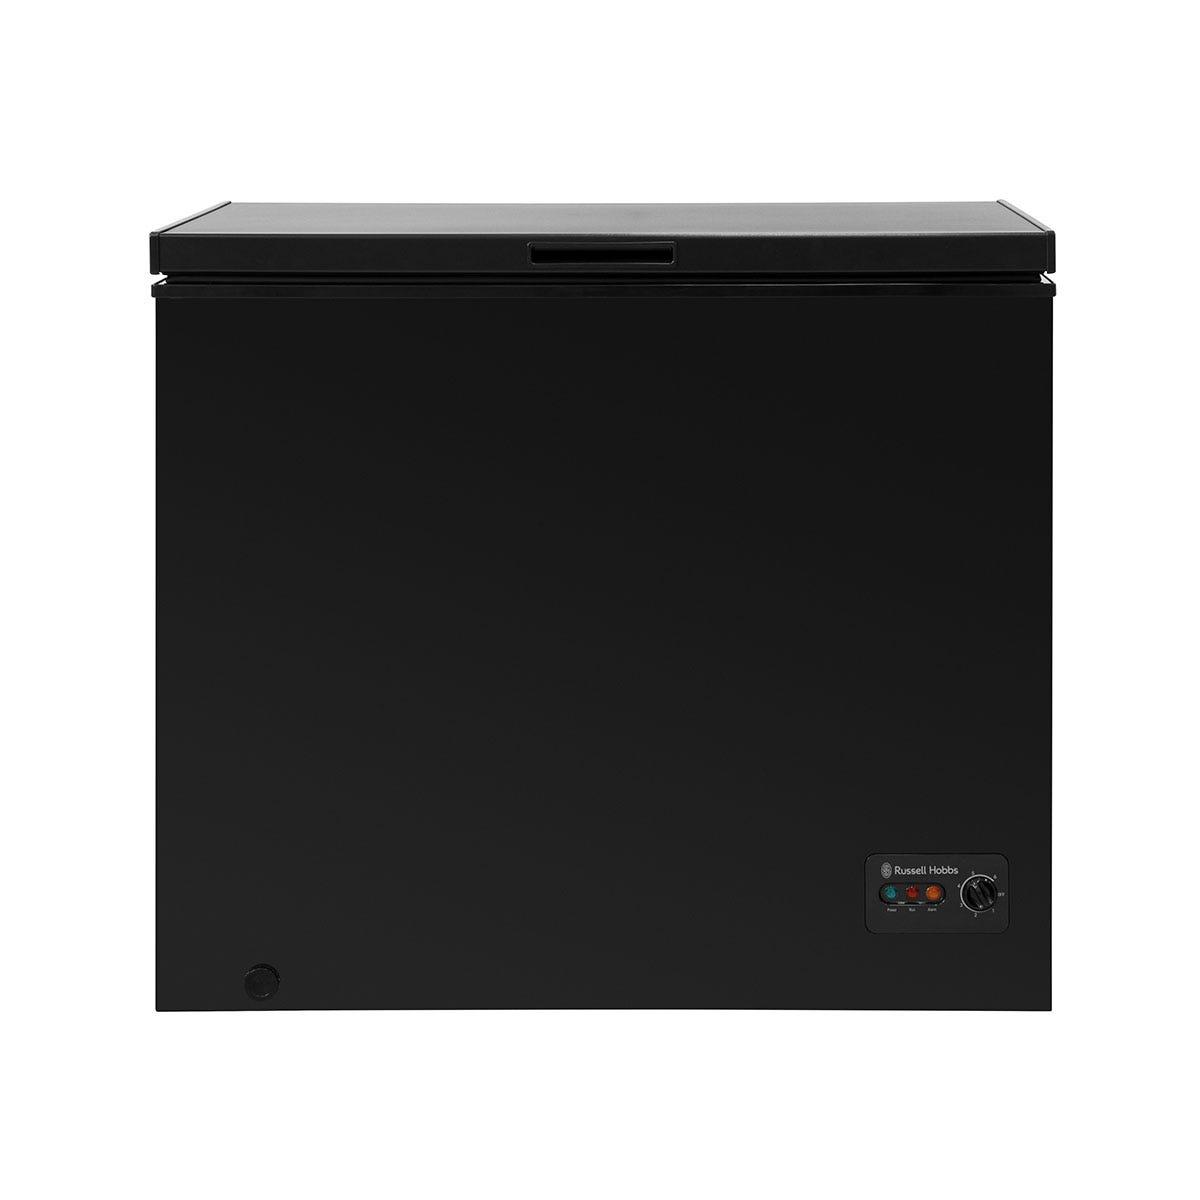 Russell Hobbs RHCF198B 198L Chest Freezer - Black